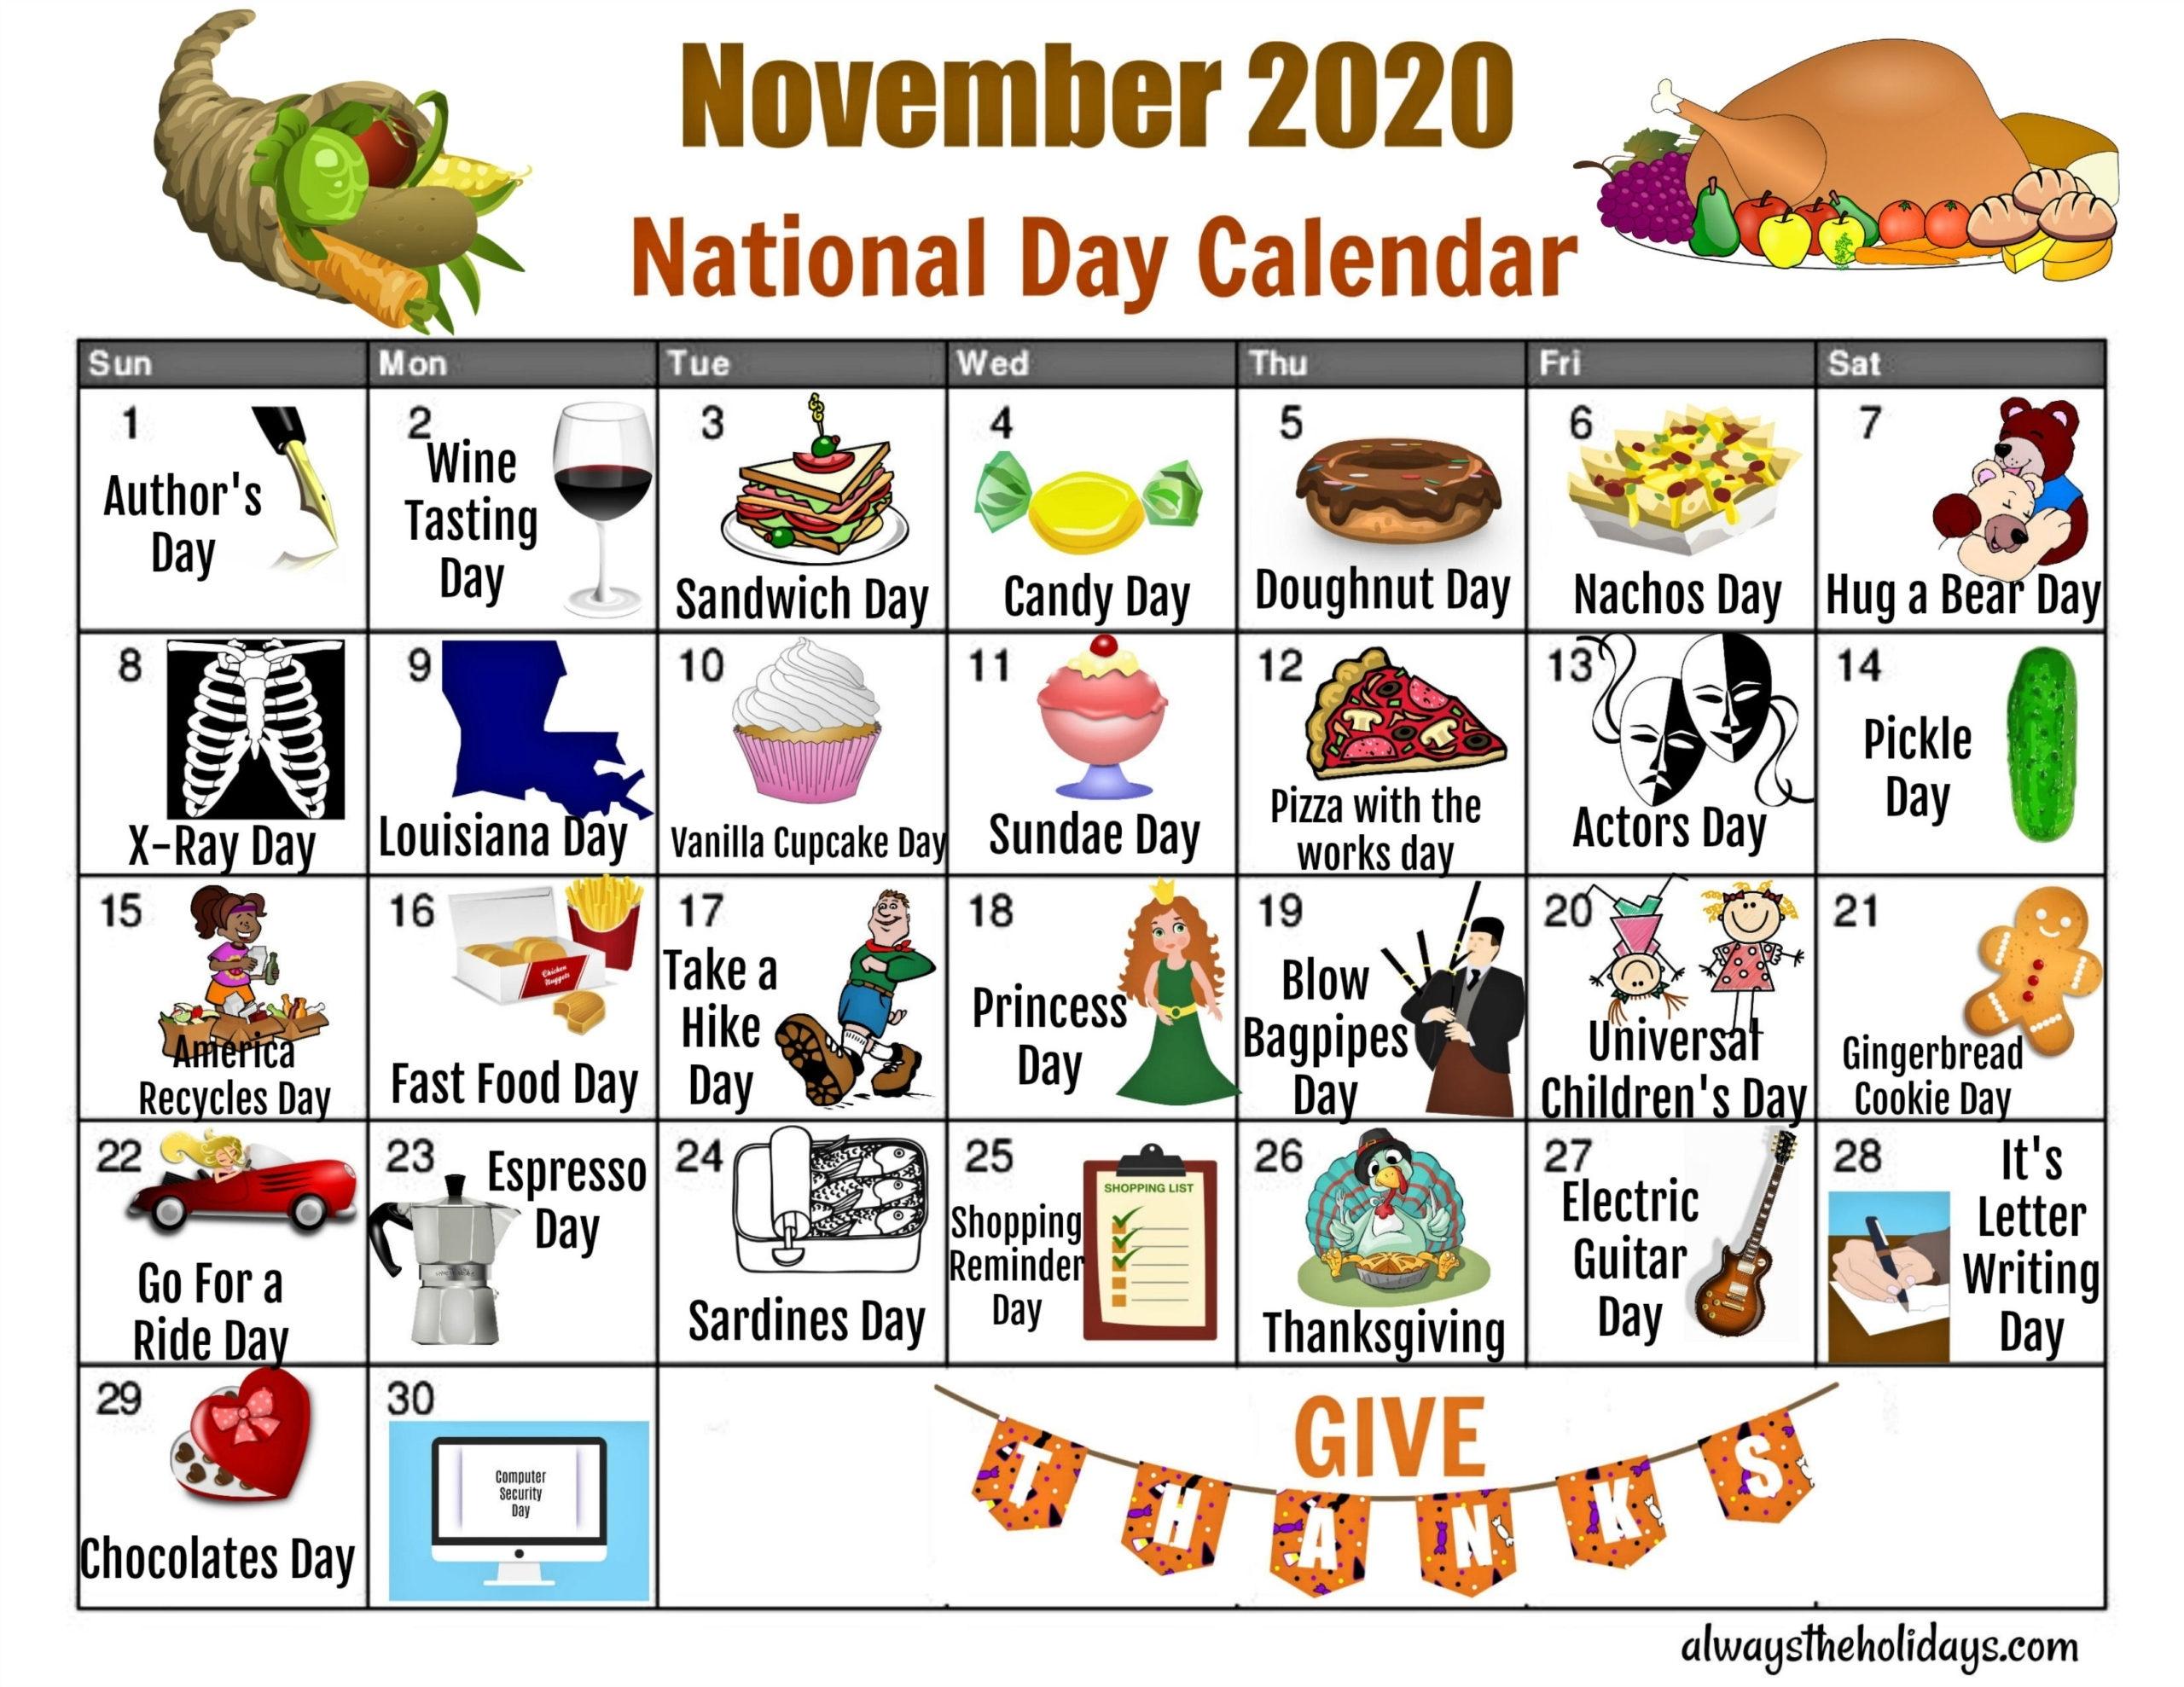 Get Free Printable National Day Calendar